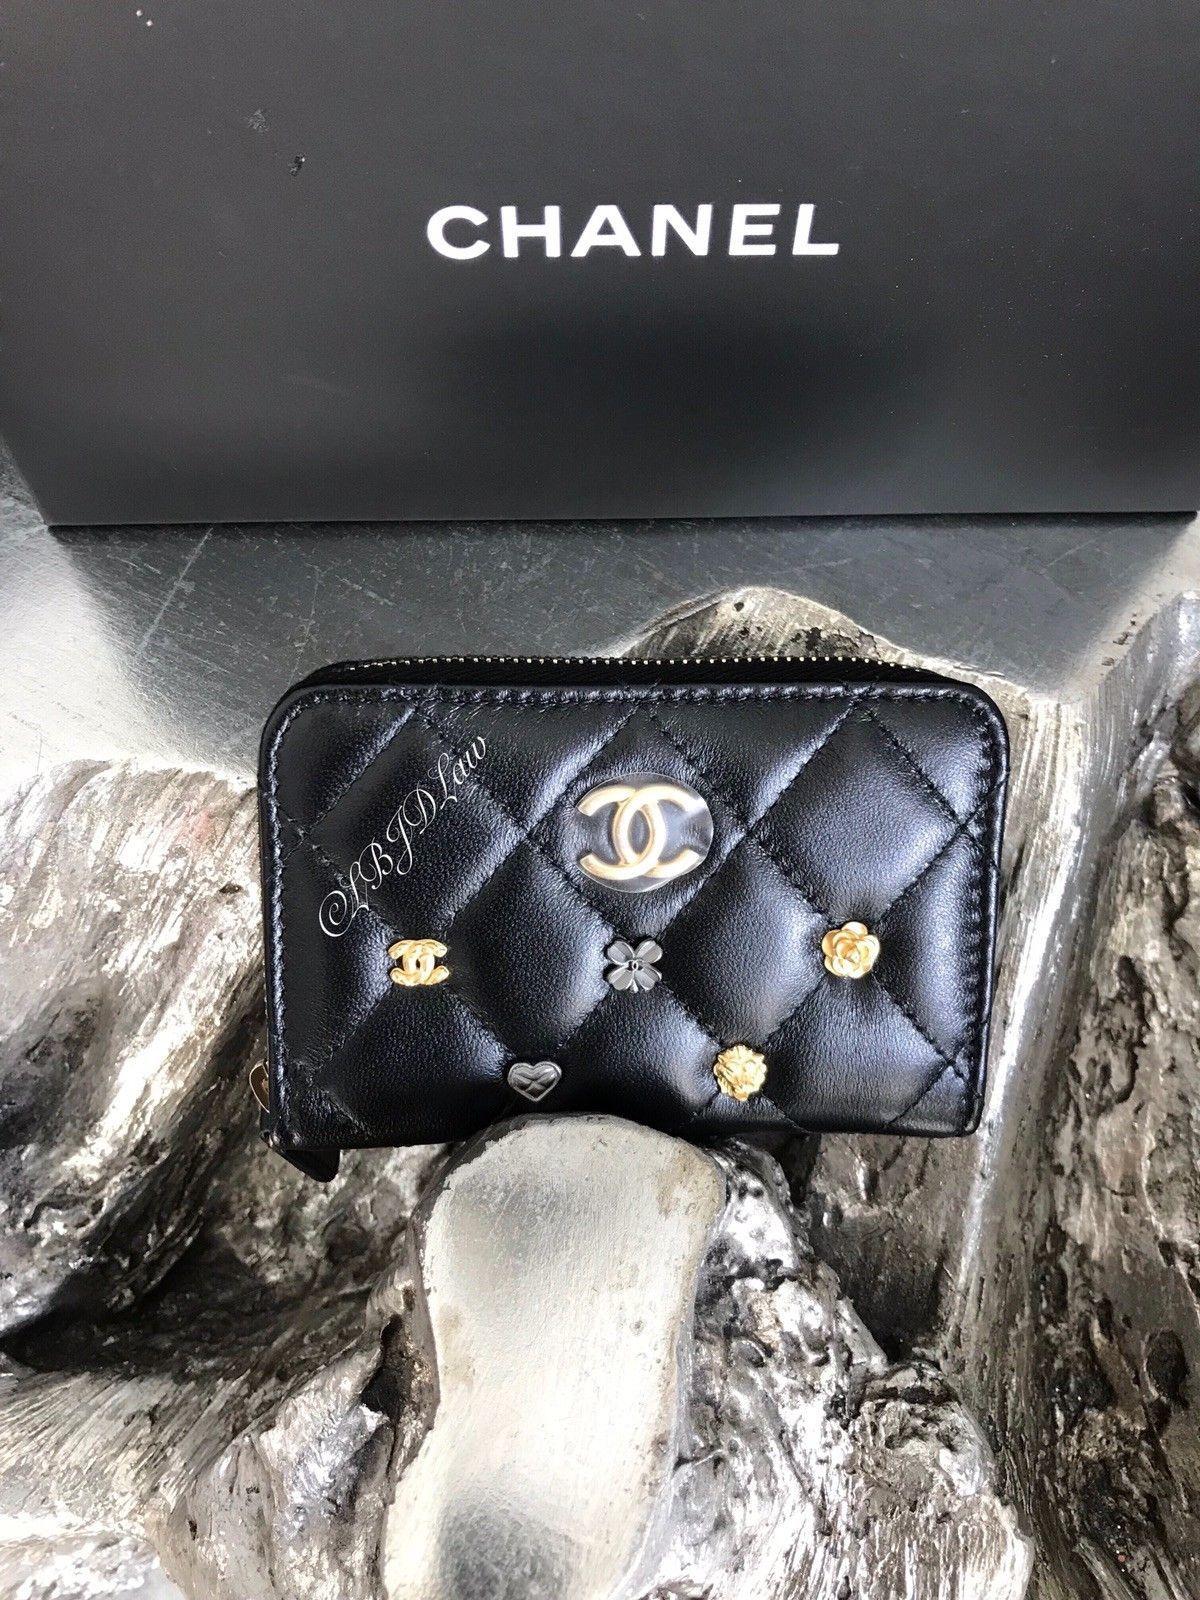 9d3ad6e5804c NWT CHANEL Lucky Charms Coin Purse Card Holder Case 2018 Black Lamb  Mademoiselle | eBay